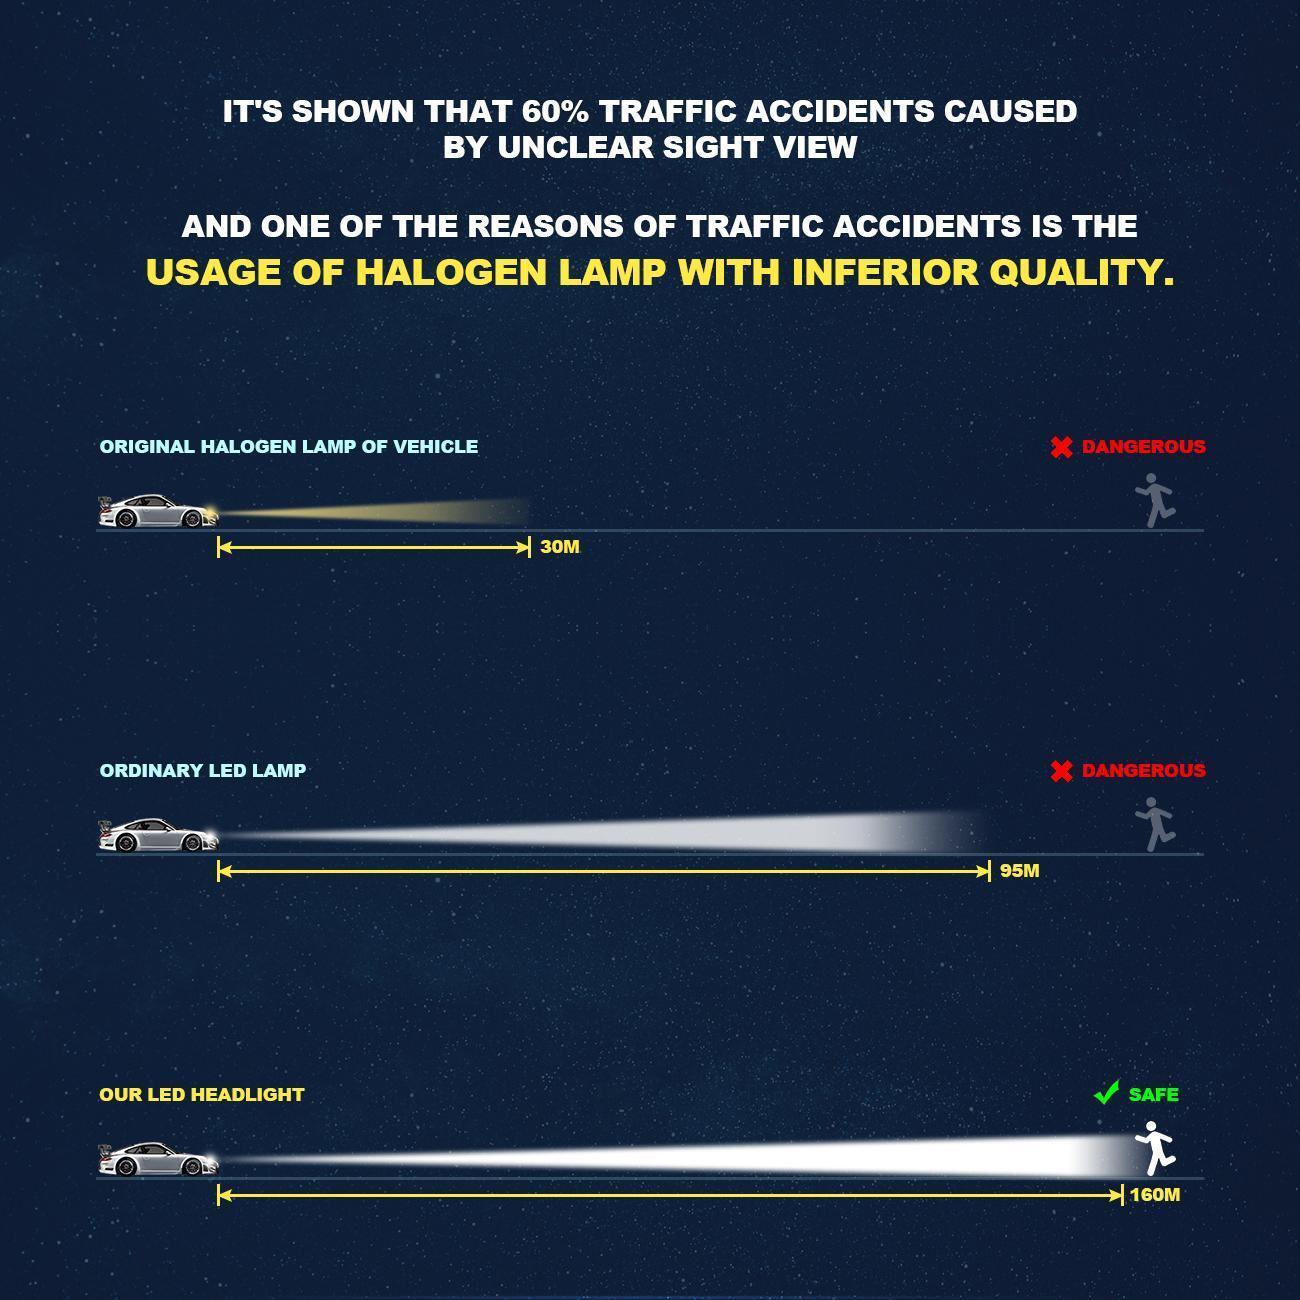 Chevy Trailblazer Headlight Wiring Diagram As Well 2002 Chevy